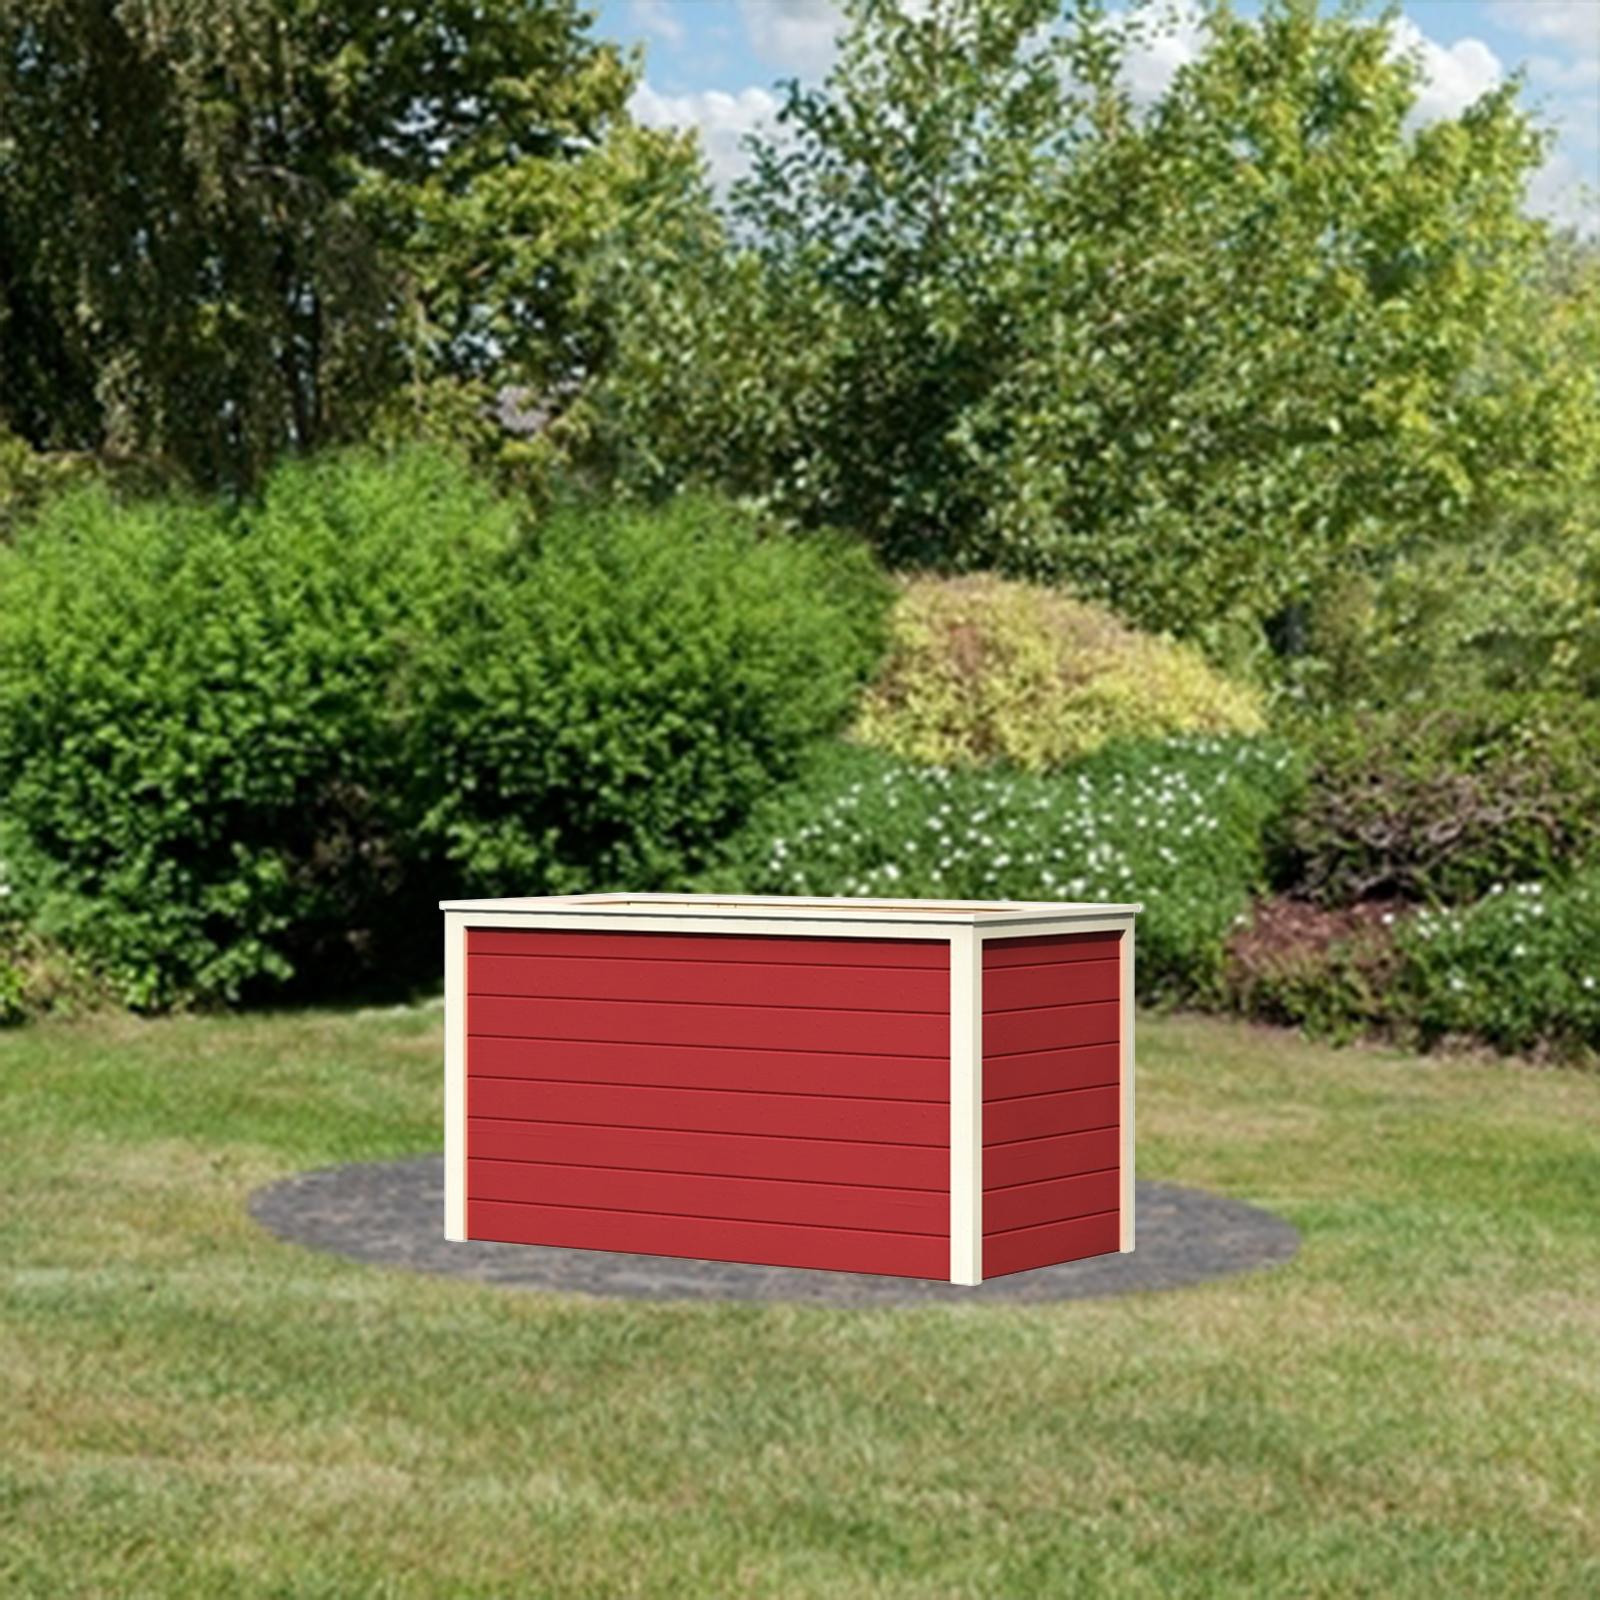 karibu hochbeet 18 mm holz pflanzenbeet gem sebeet. Black Bedroom Furniture Sets. Home Design Ideas